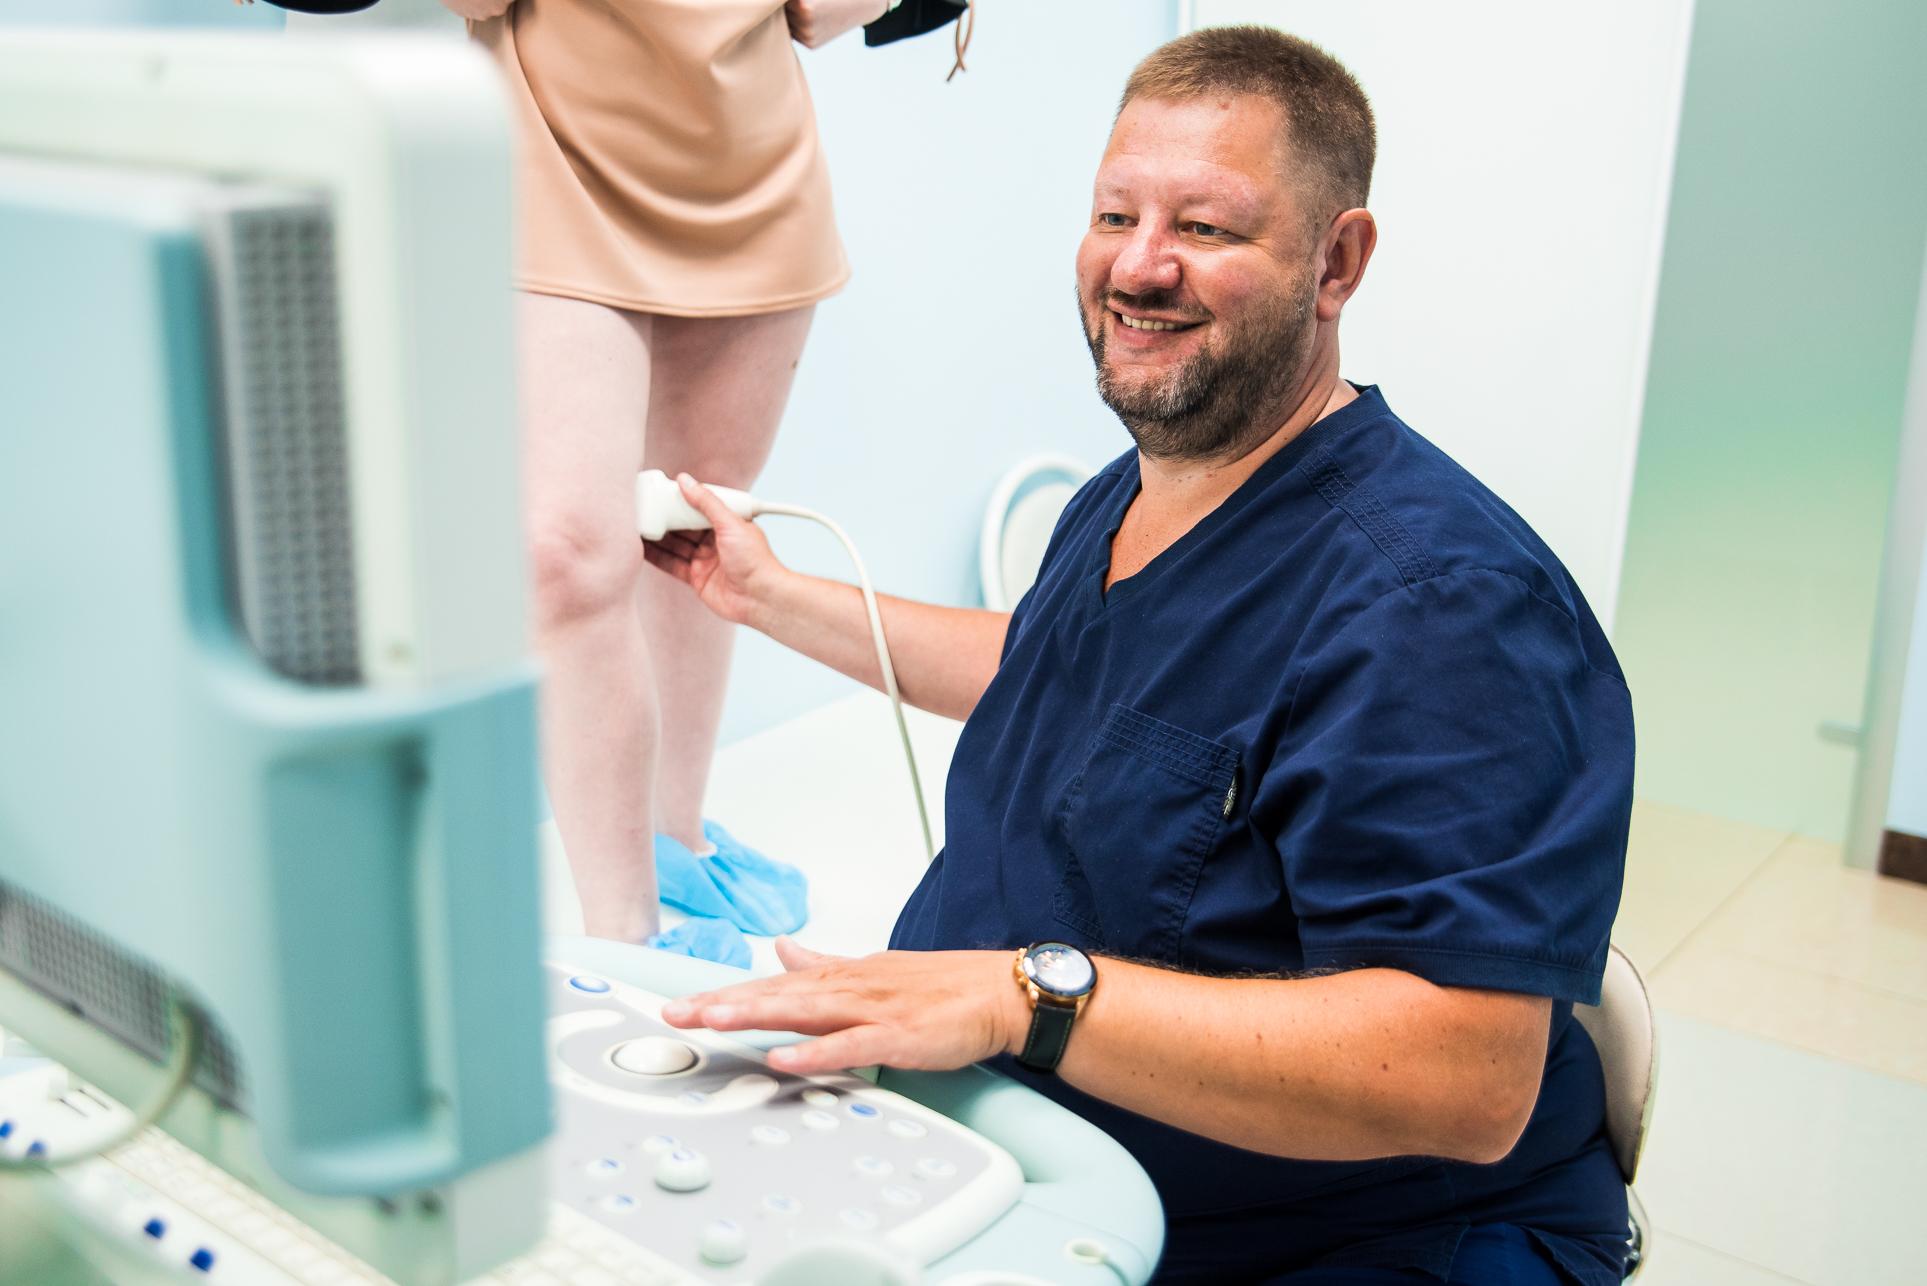 Центр лечения пациентов с проблемами флебологии